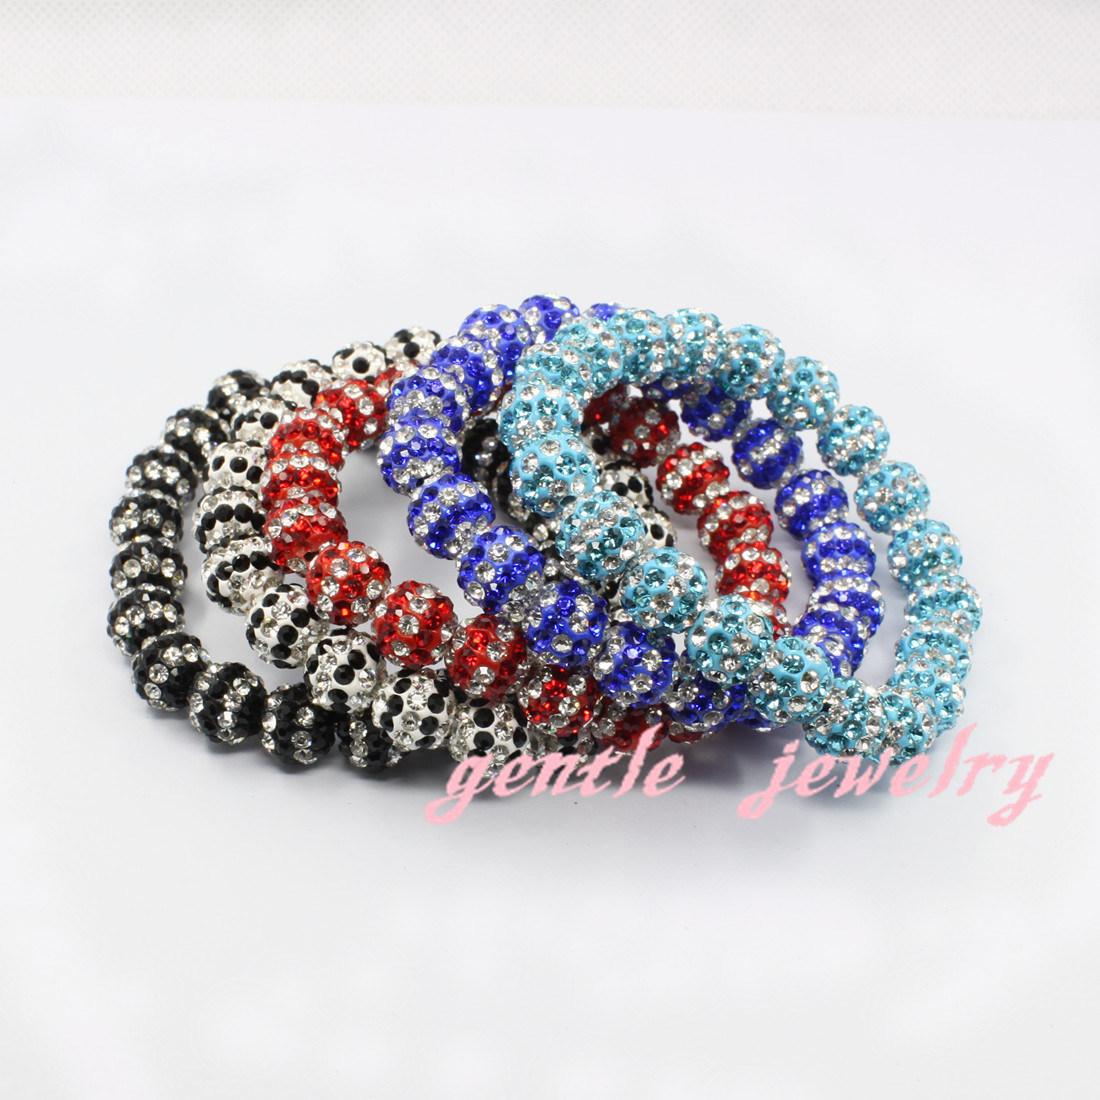 bracelet de shamballa de bijoux de mode avec la corde. Black Bedroom Furniture Sets. Home Design Ideas